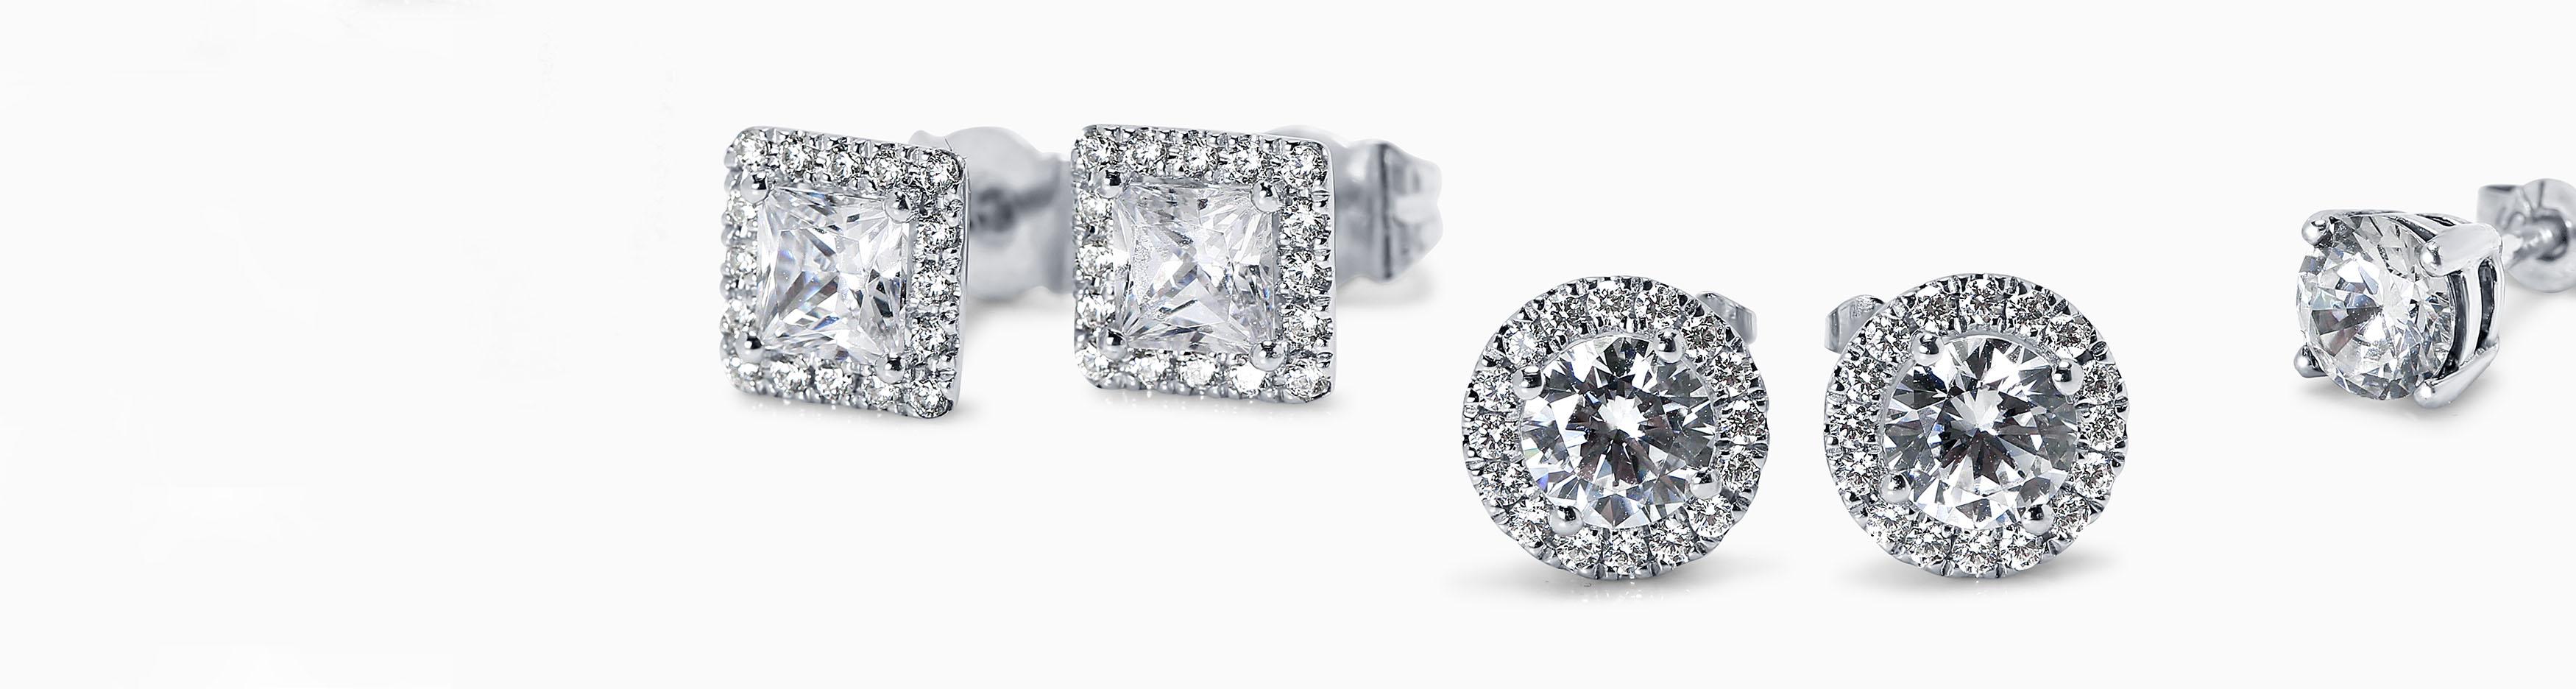 1 Carat Diamond Earring Studs